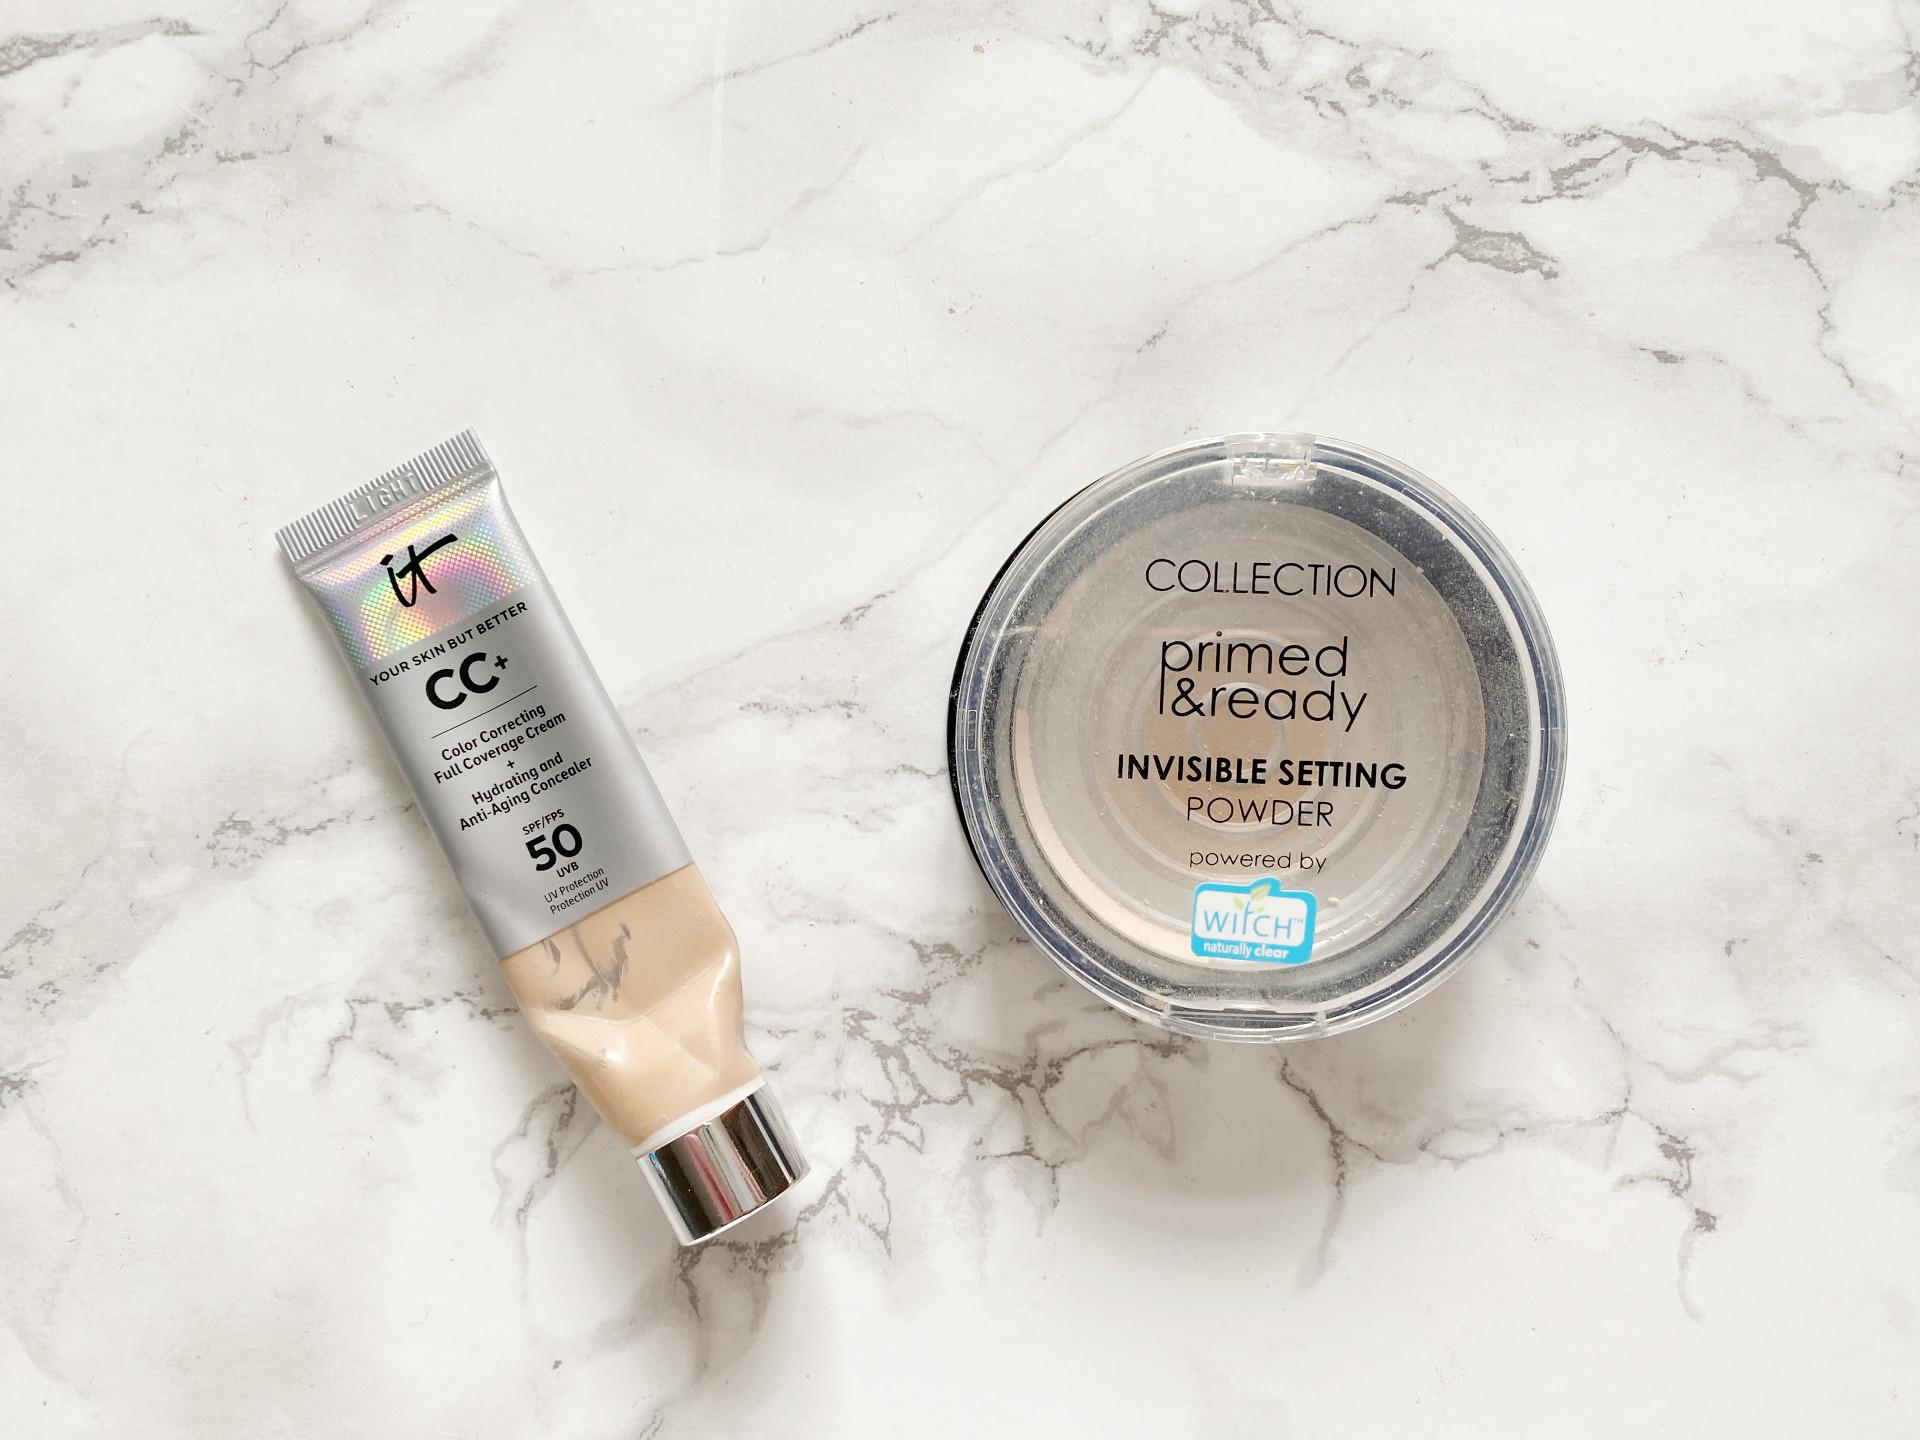 daniellesbeautyblog makeup empties it cosmetics cc review